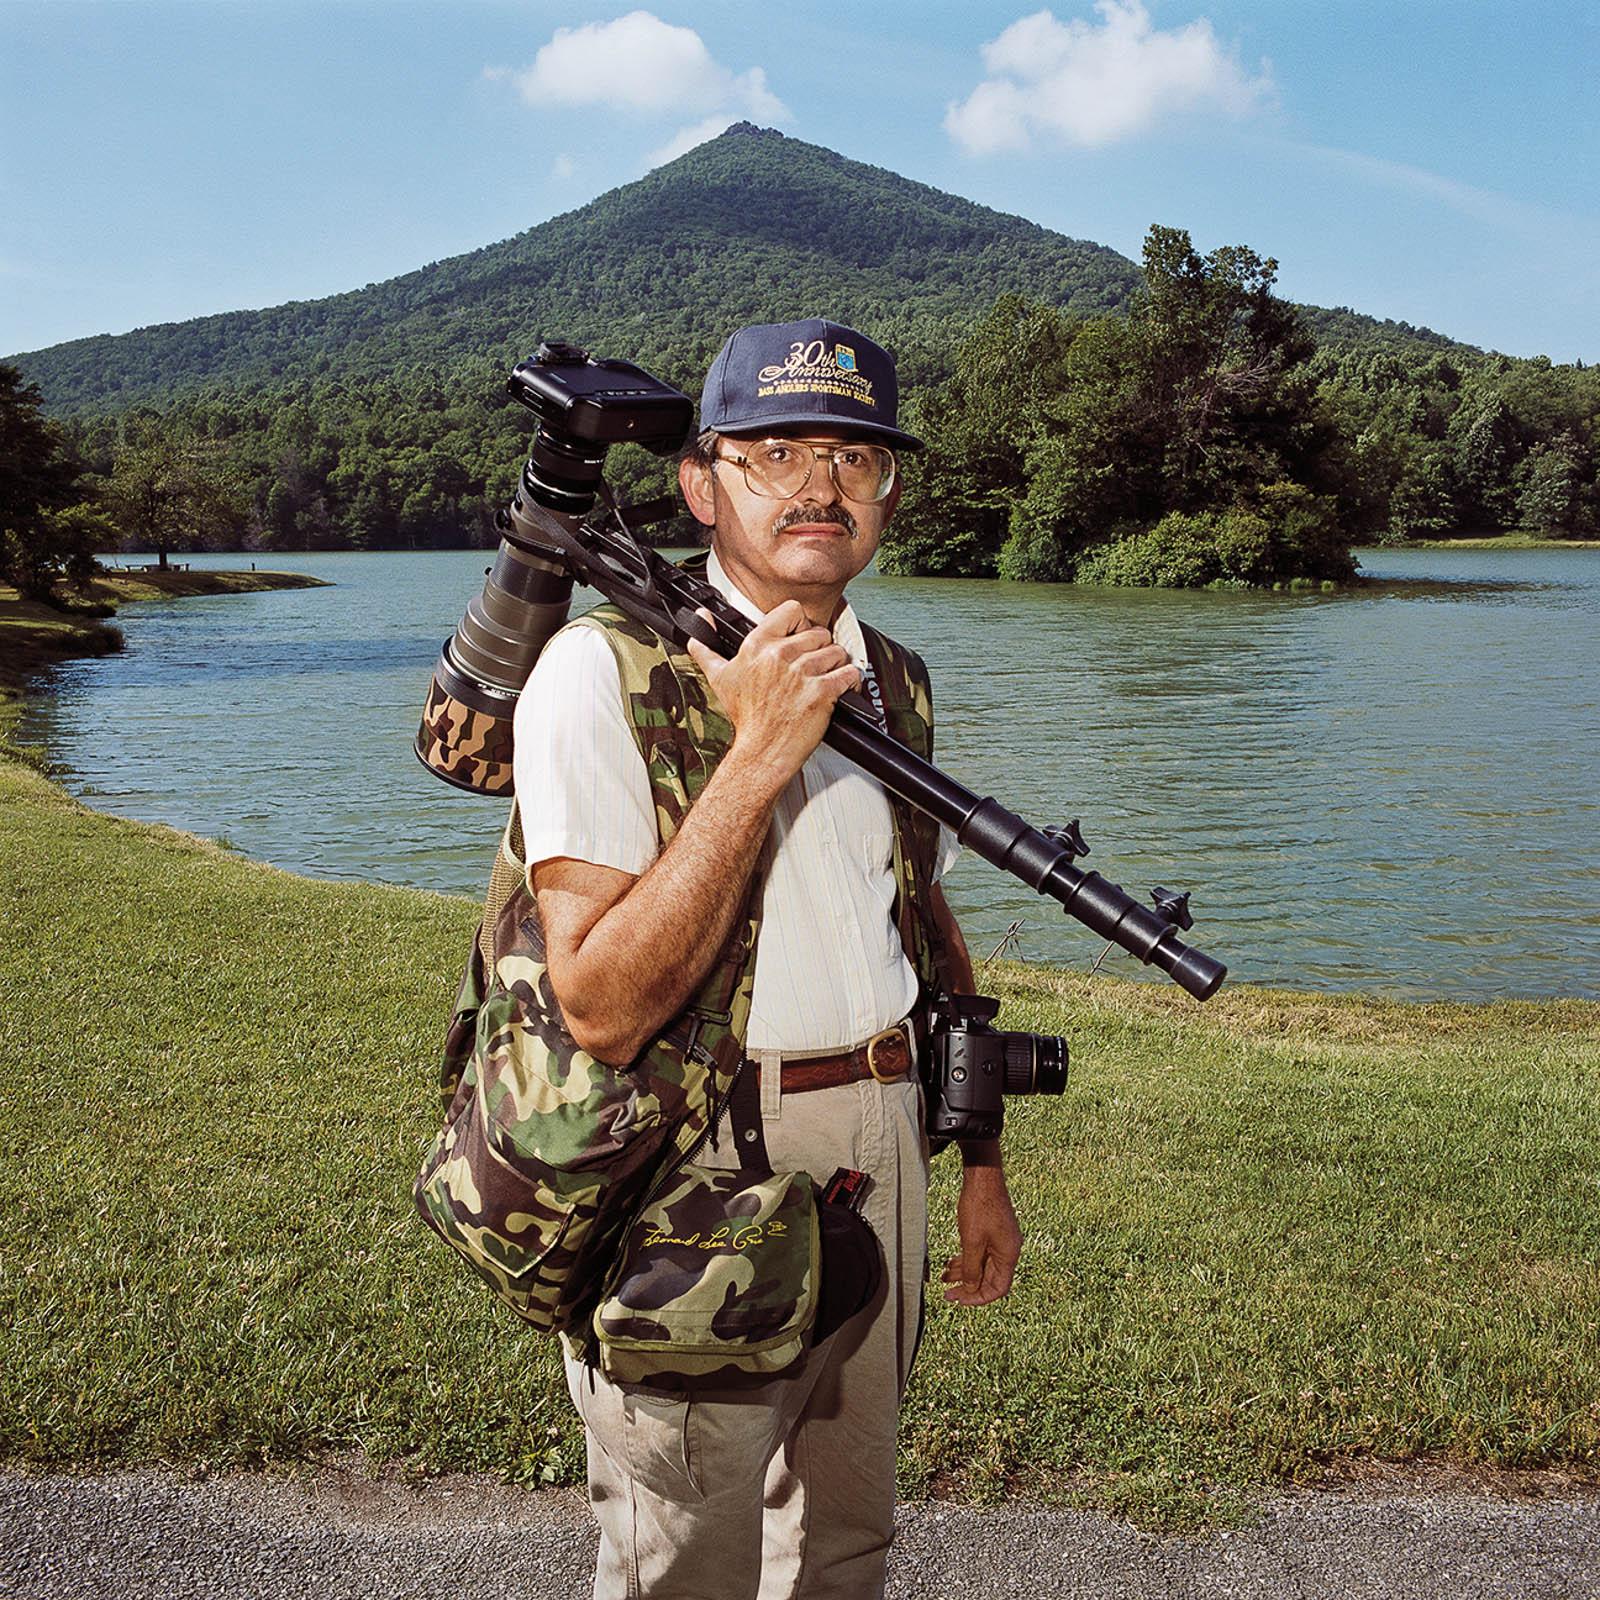 Birder at Peaks of Otter, Blue Ridge Parkway, Virginia 1999